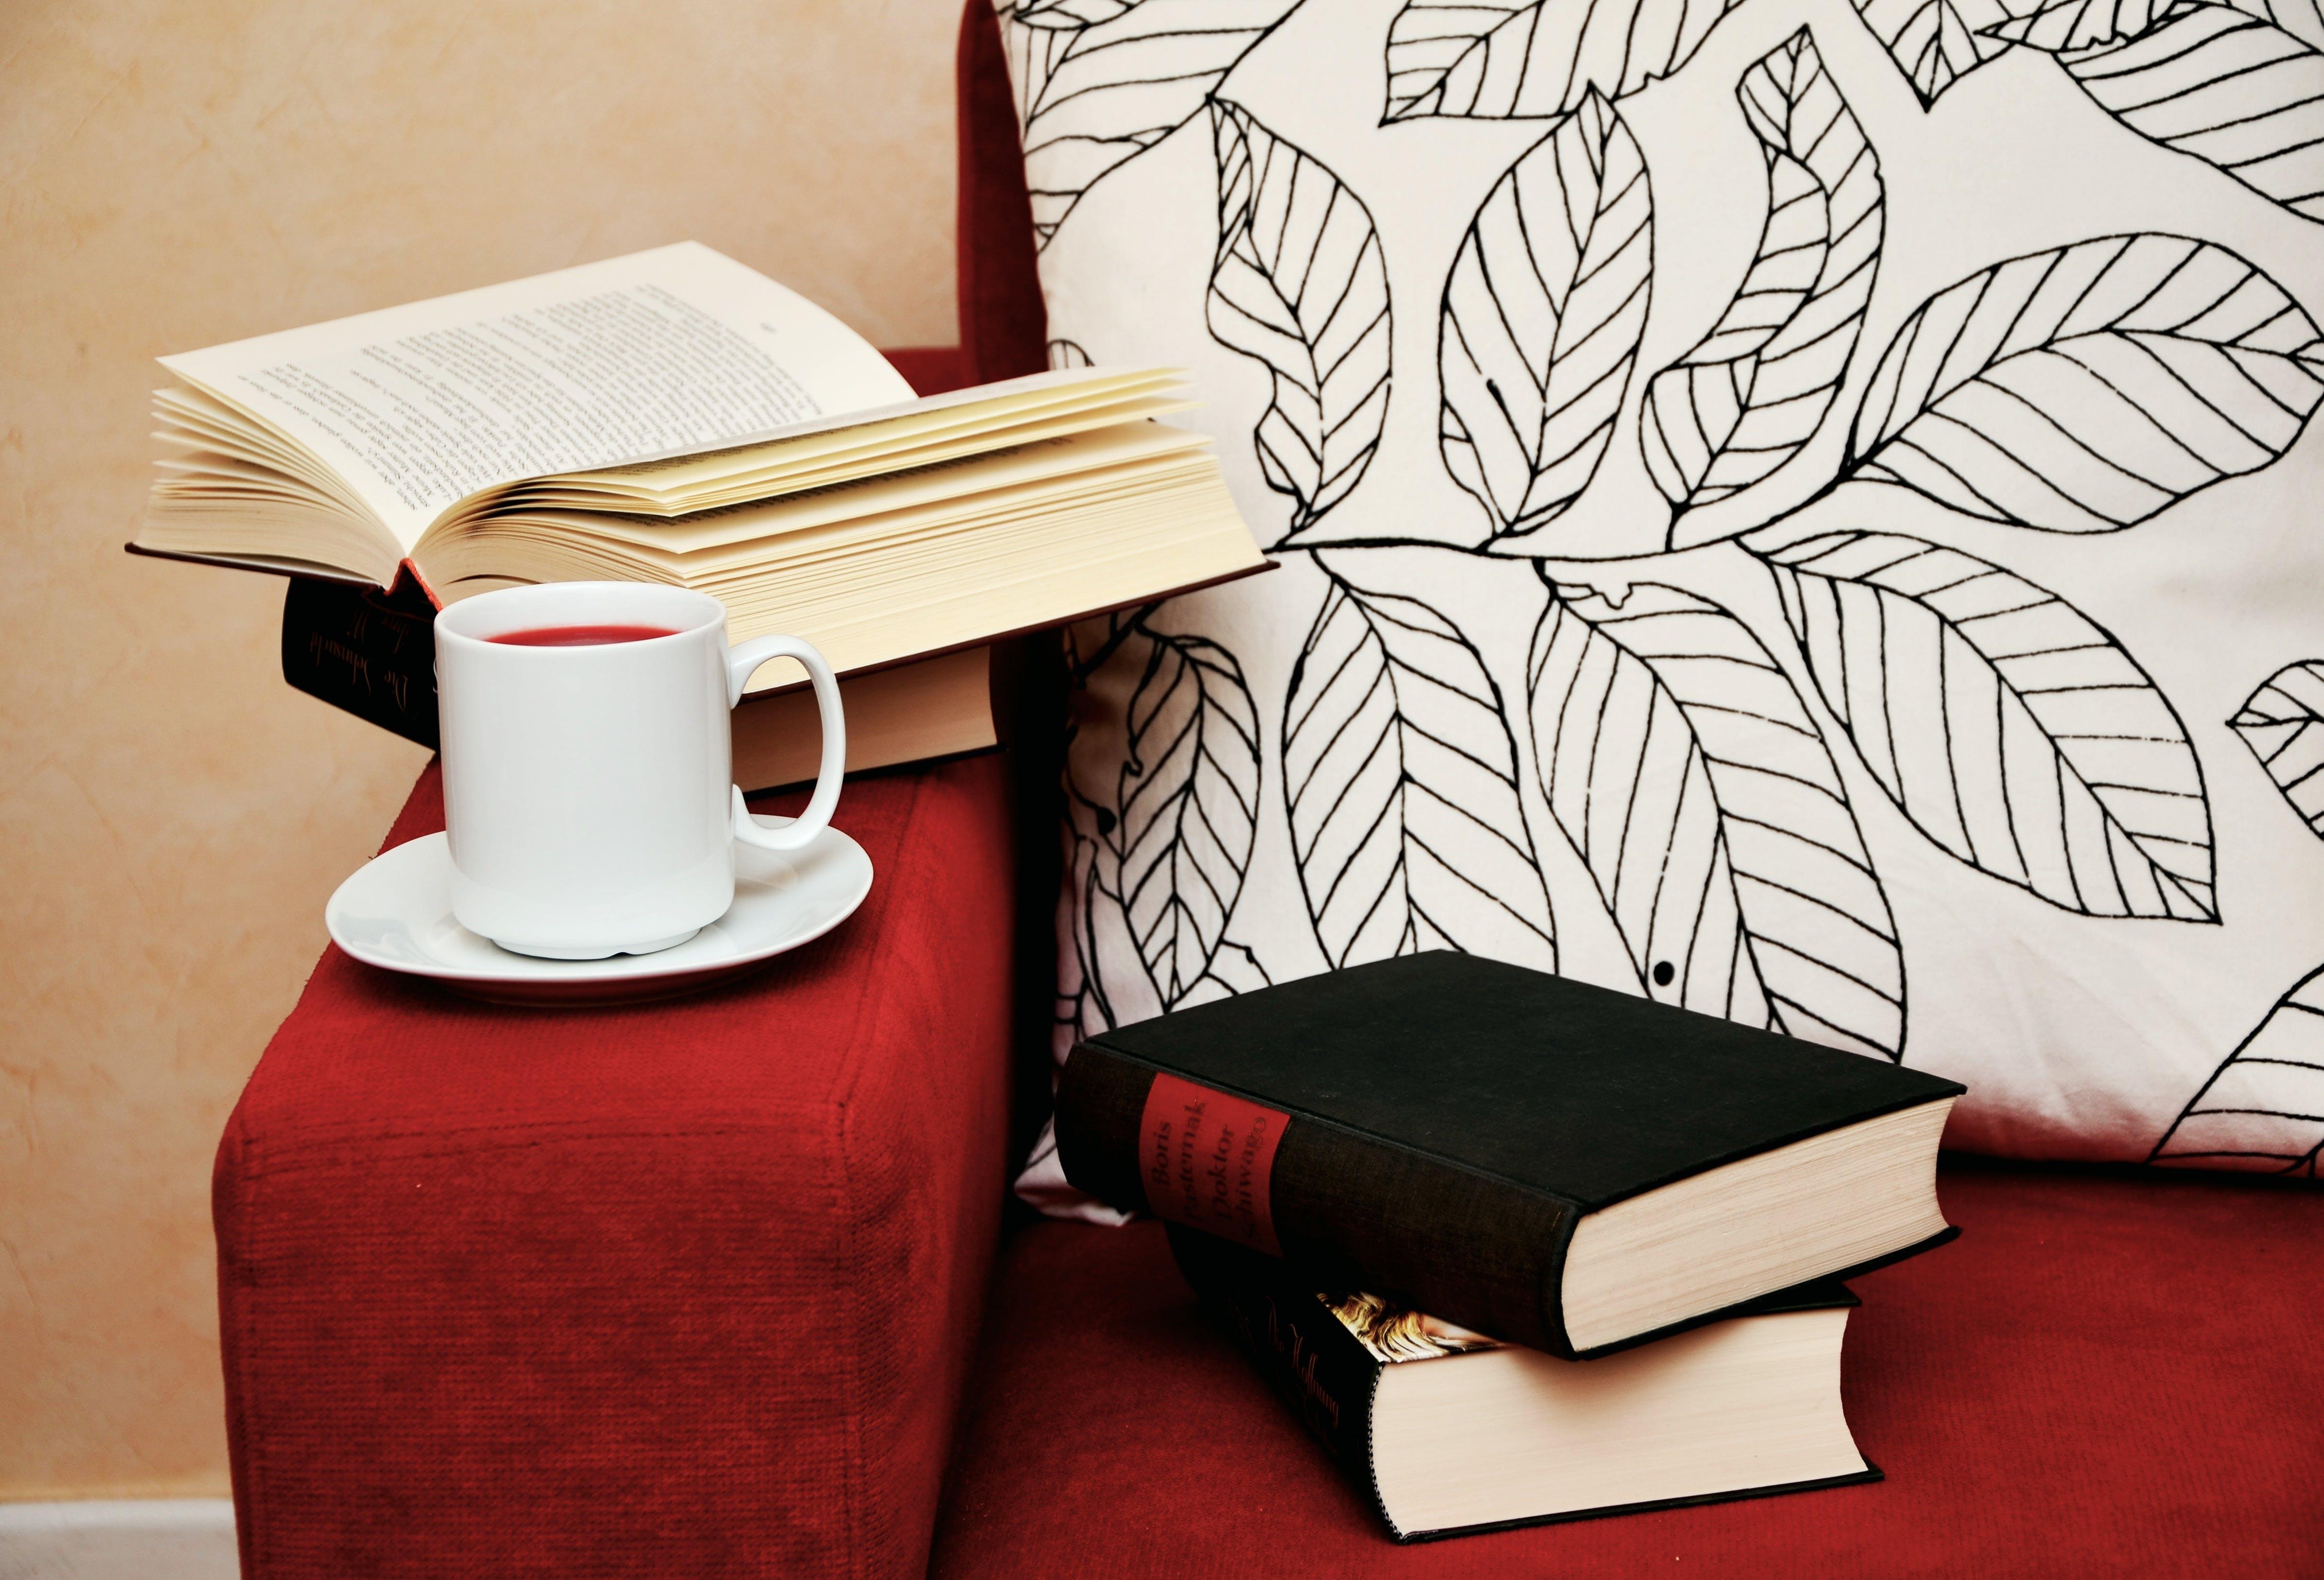 Two Hardbound Books on Sofa